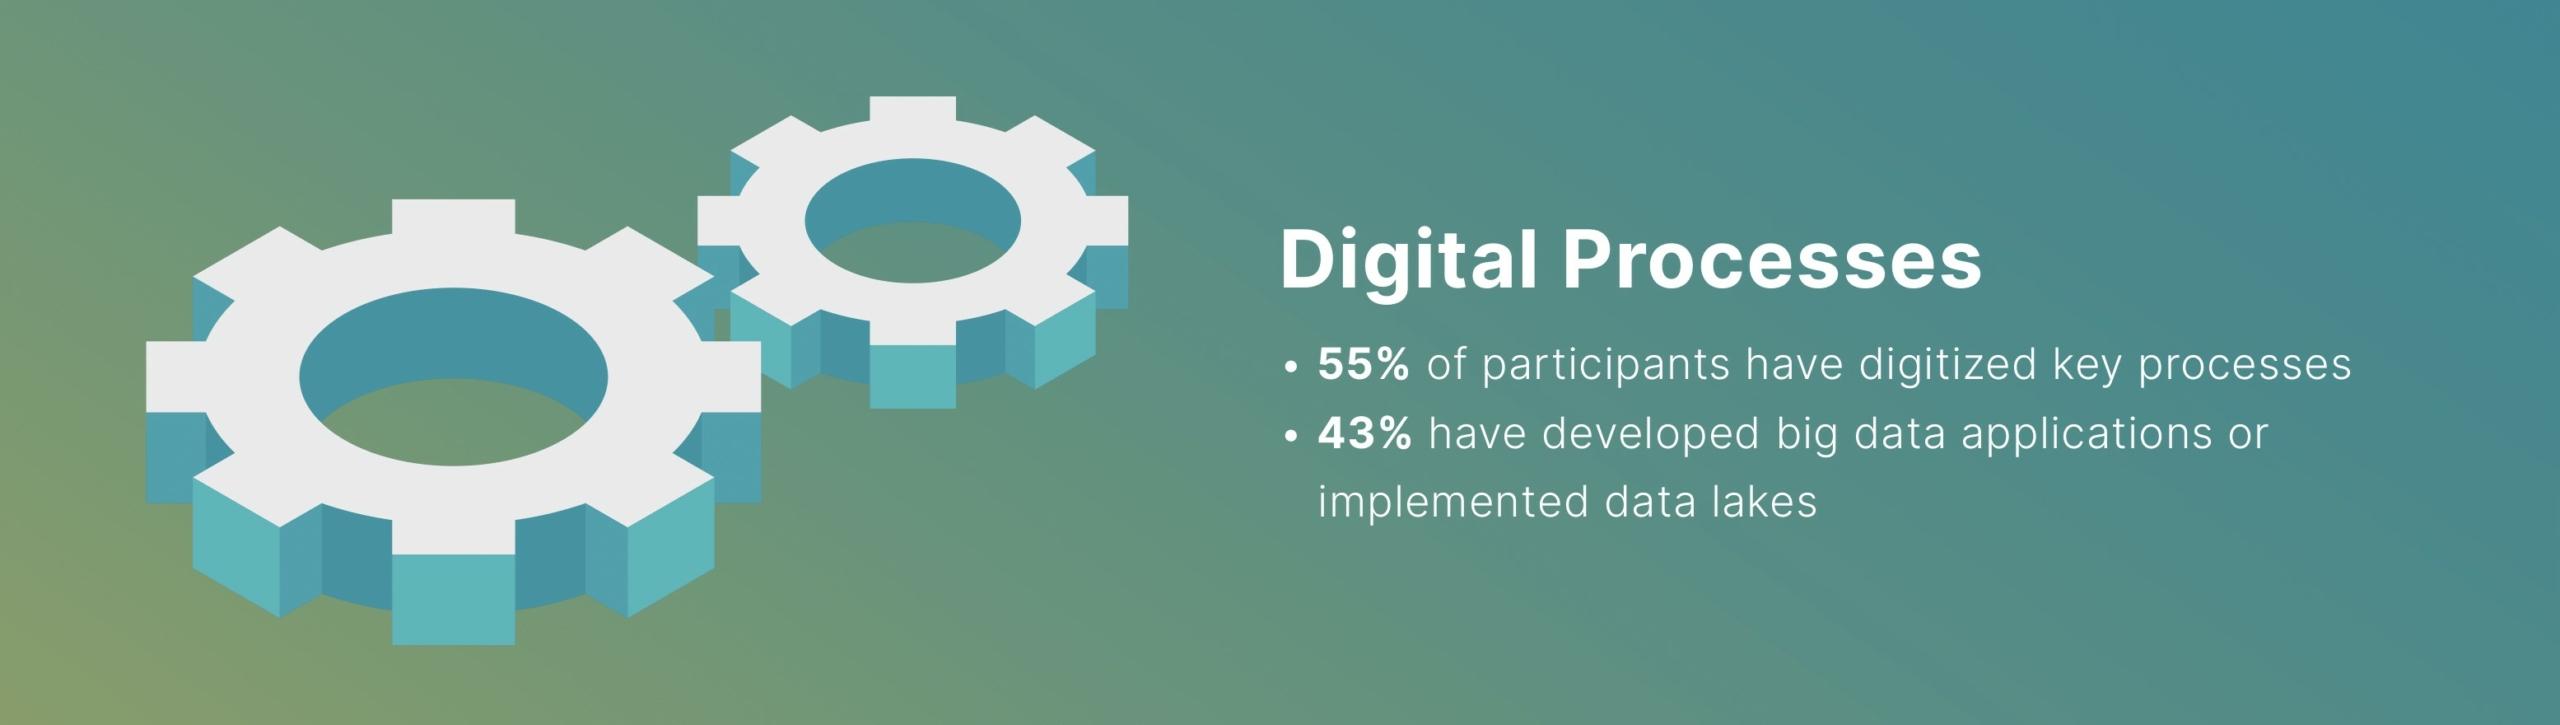 Digital Processess